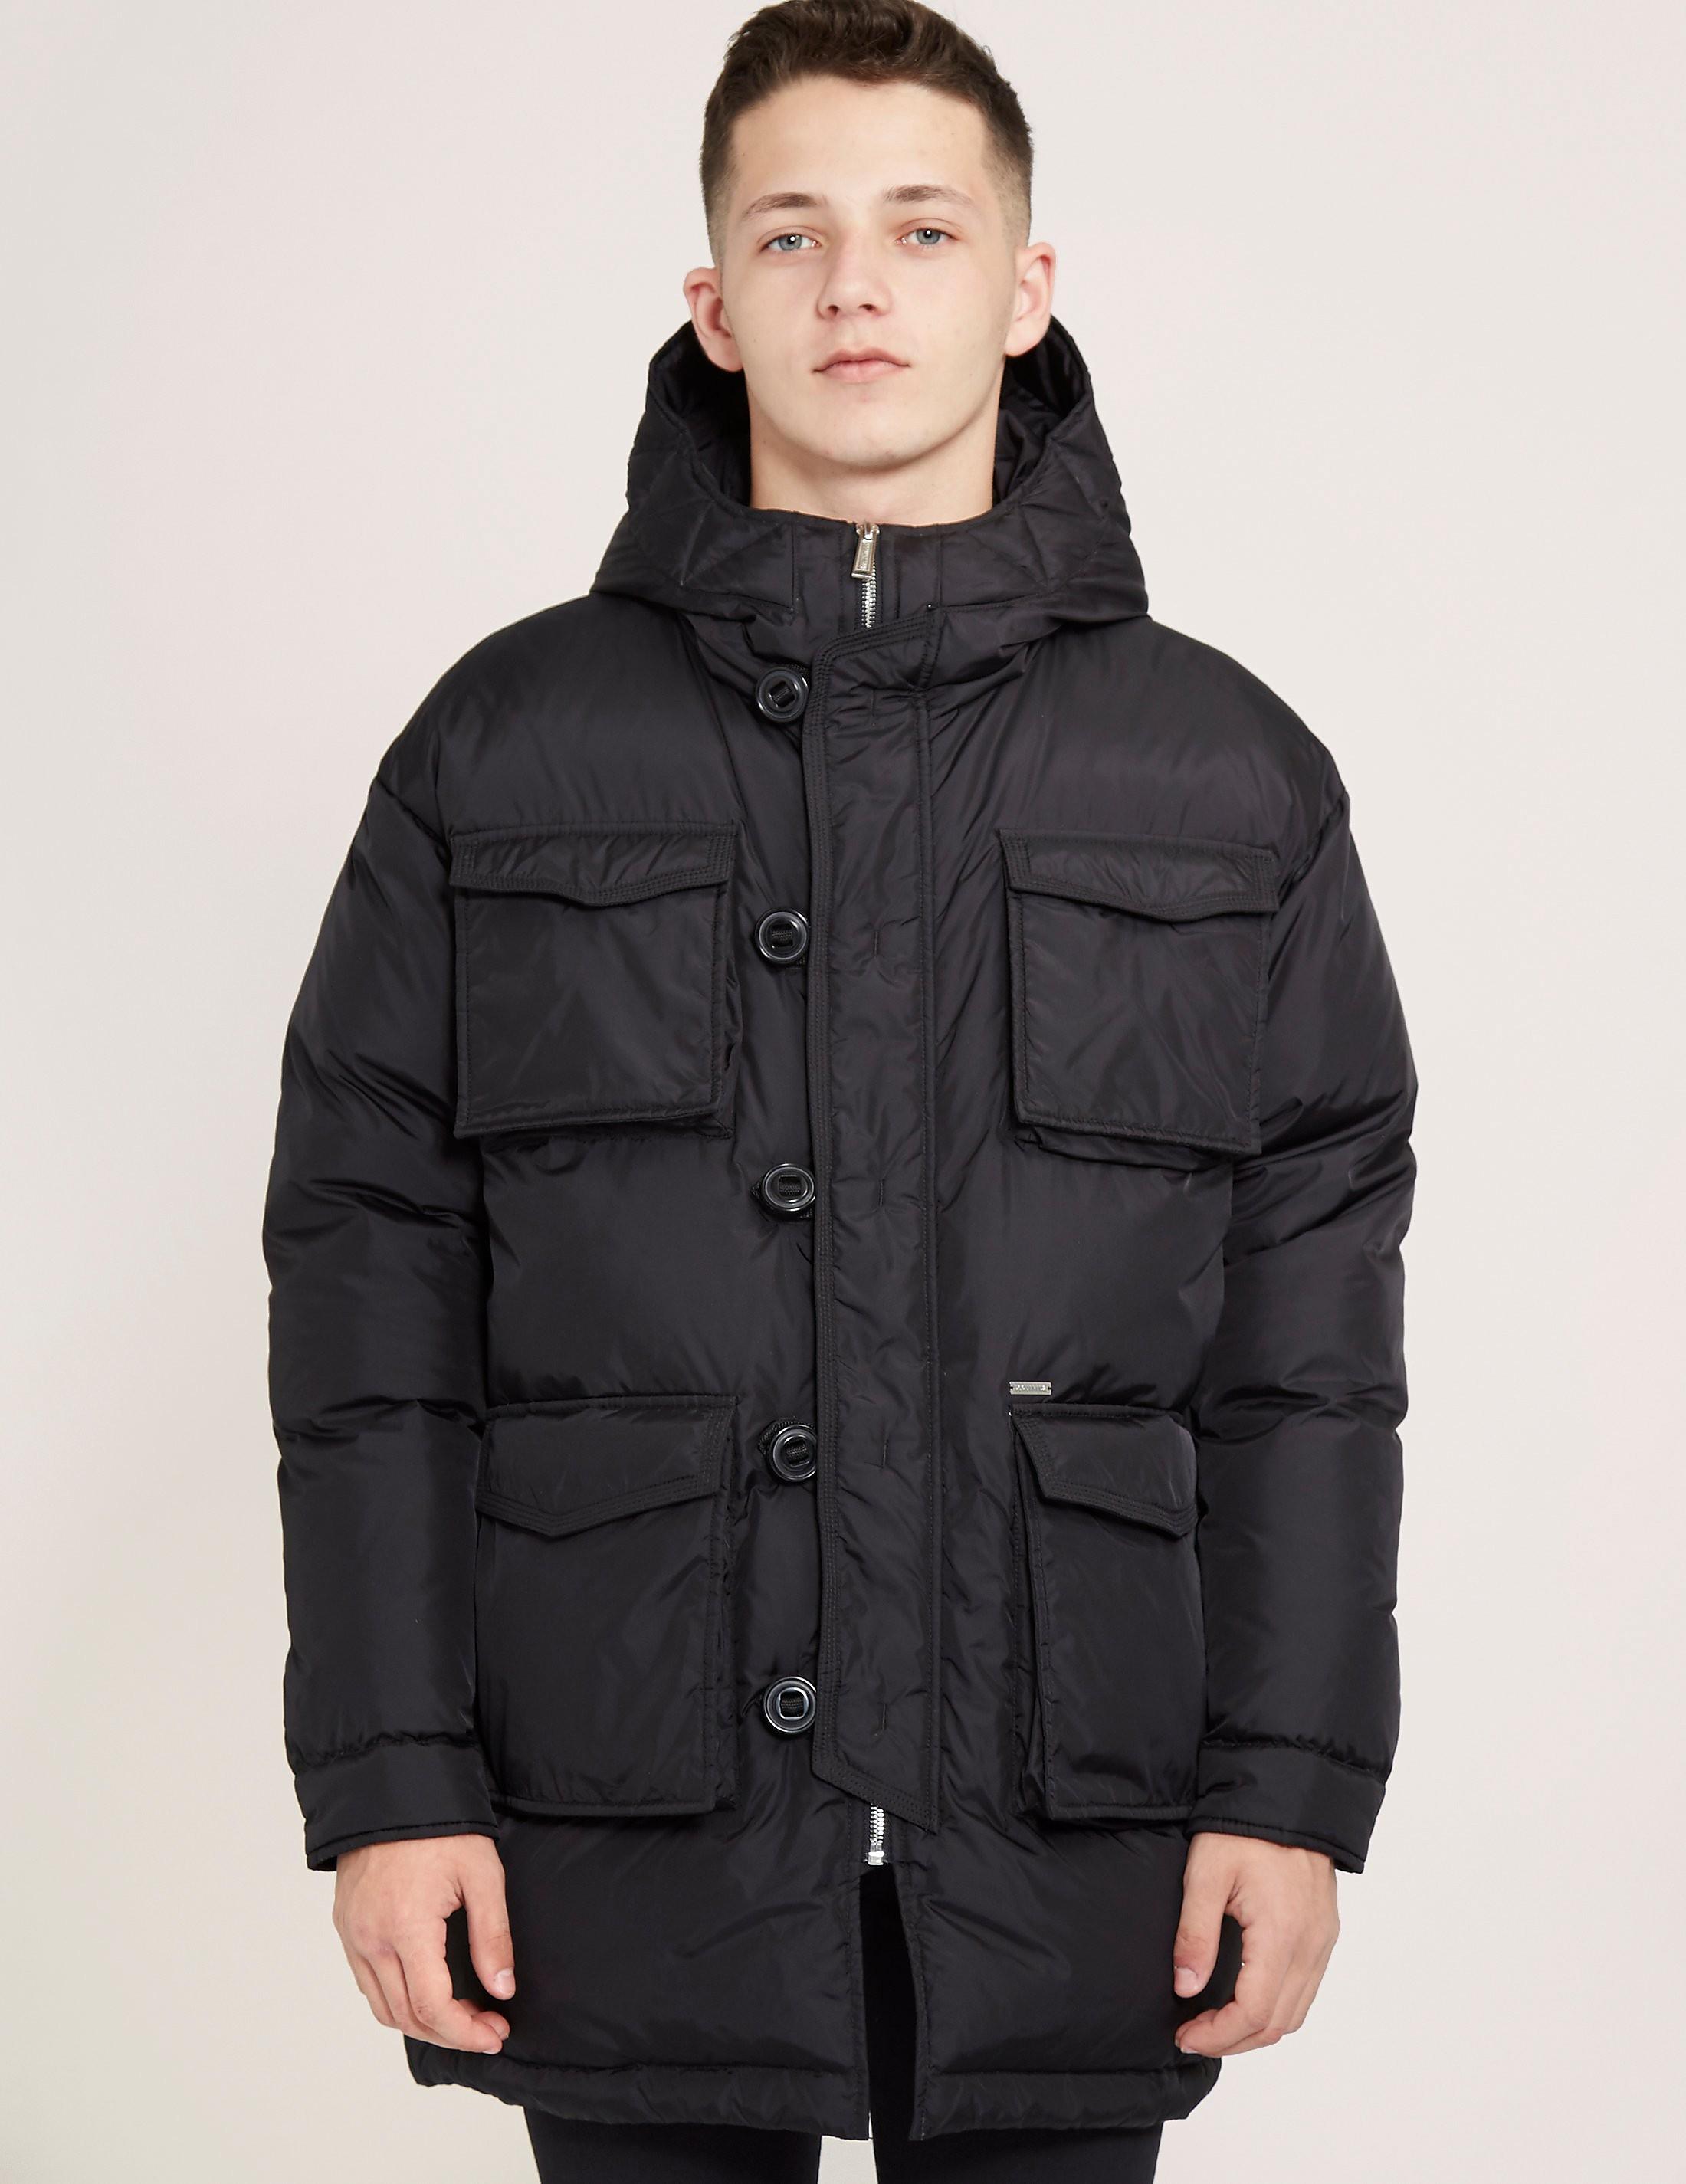 DSQUARED2 4 Pocket Padded Jacket